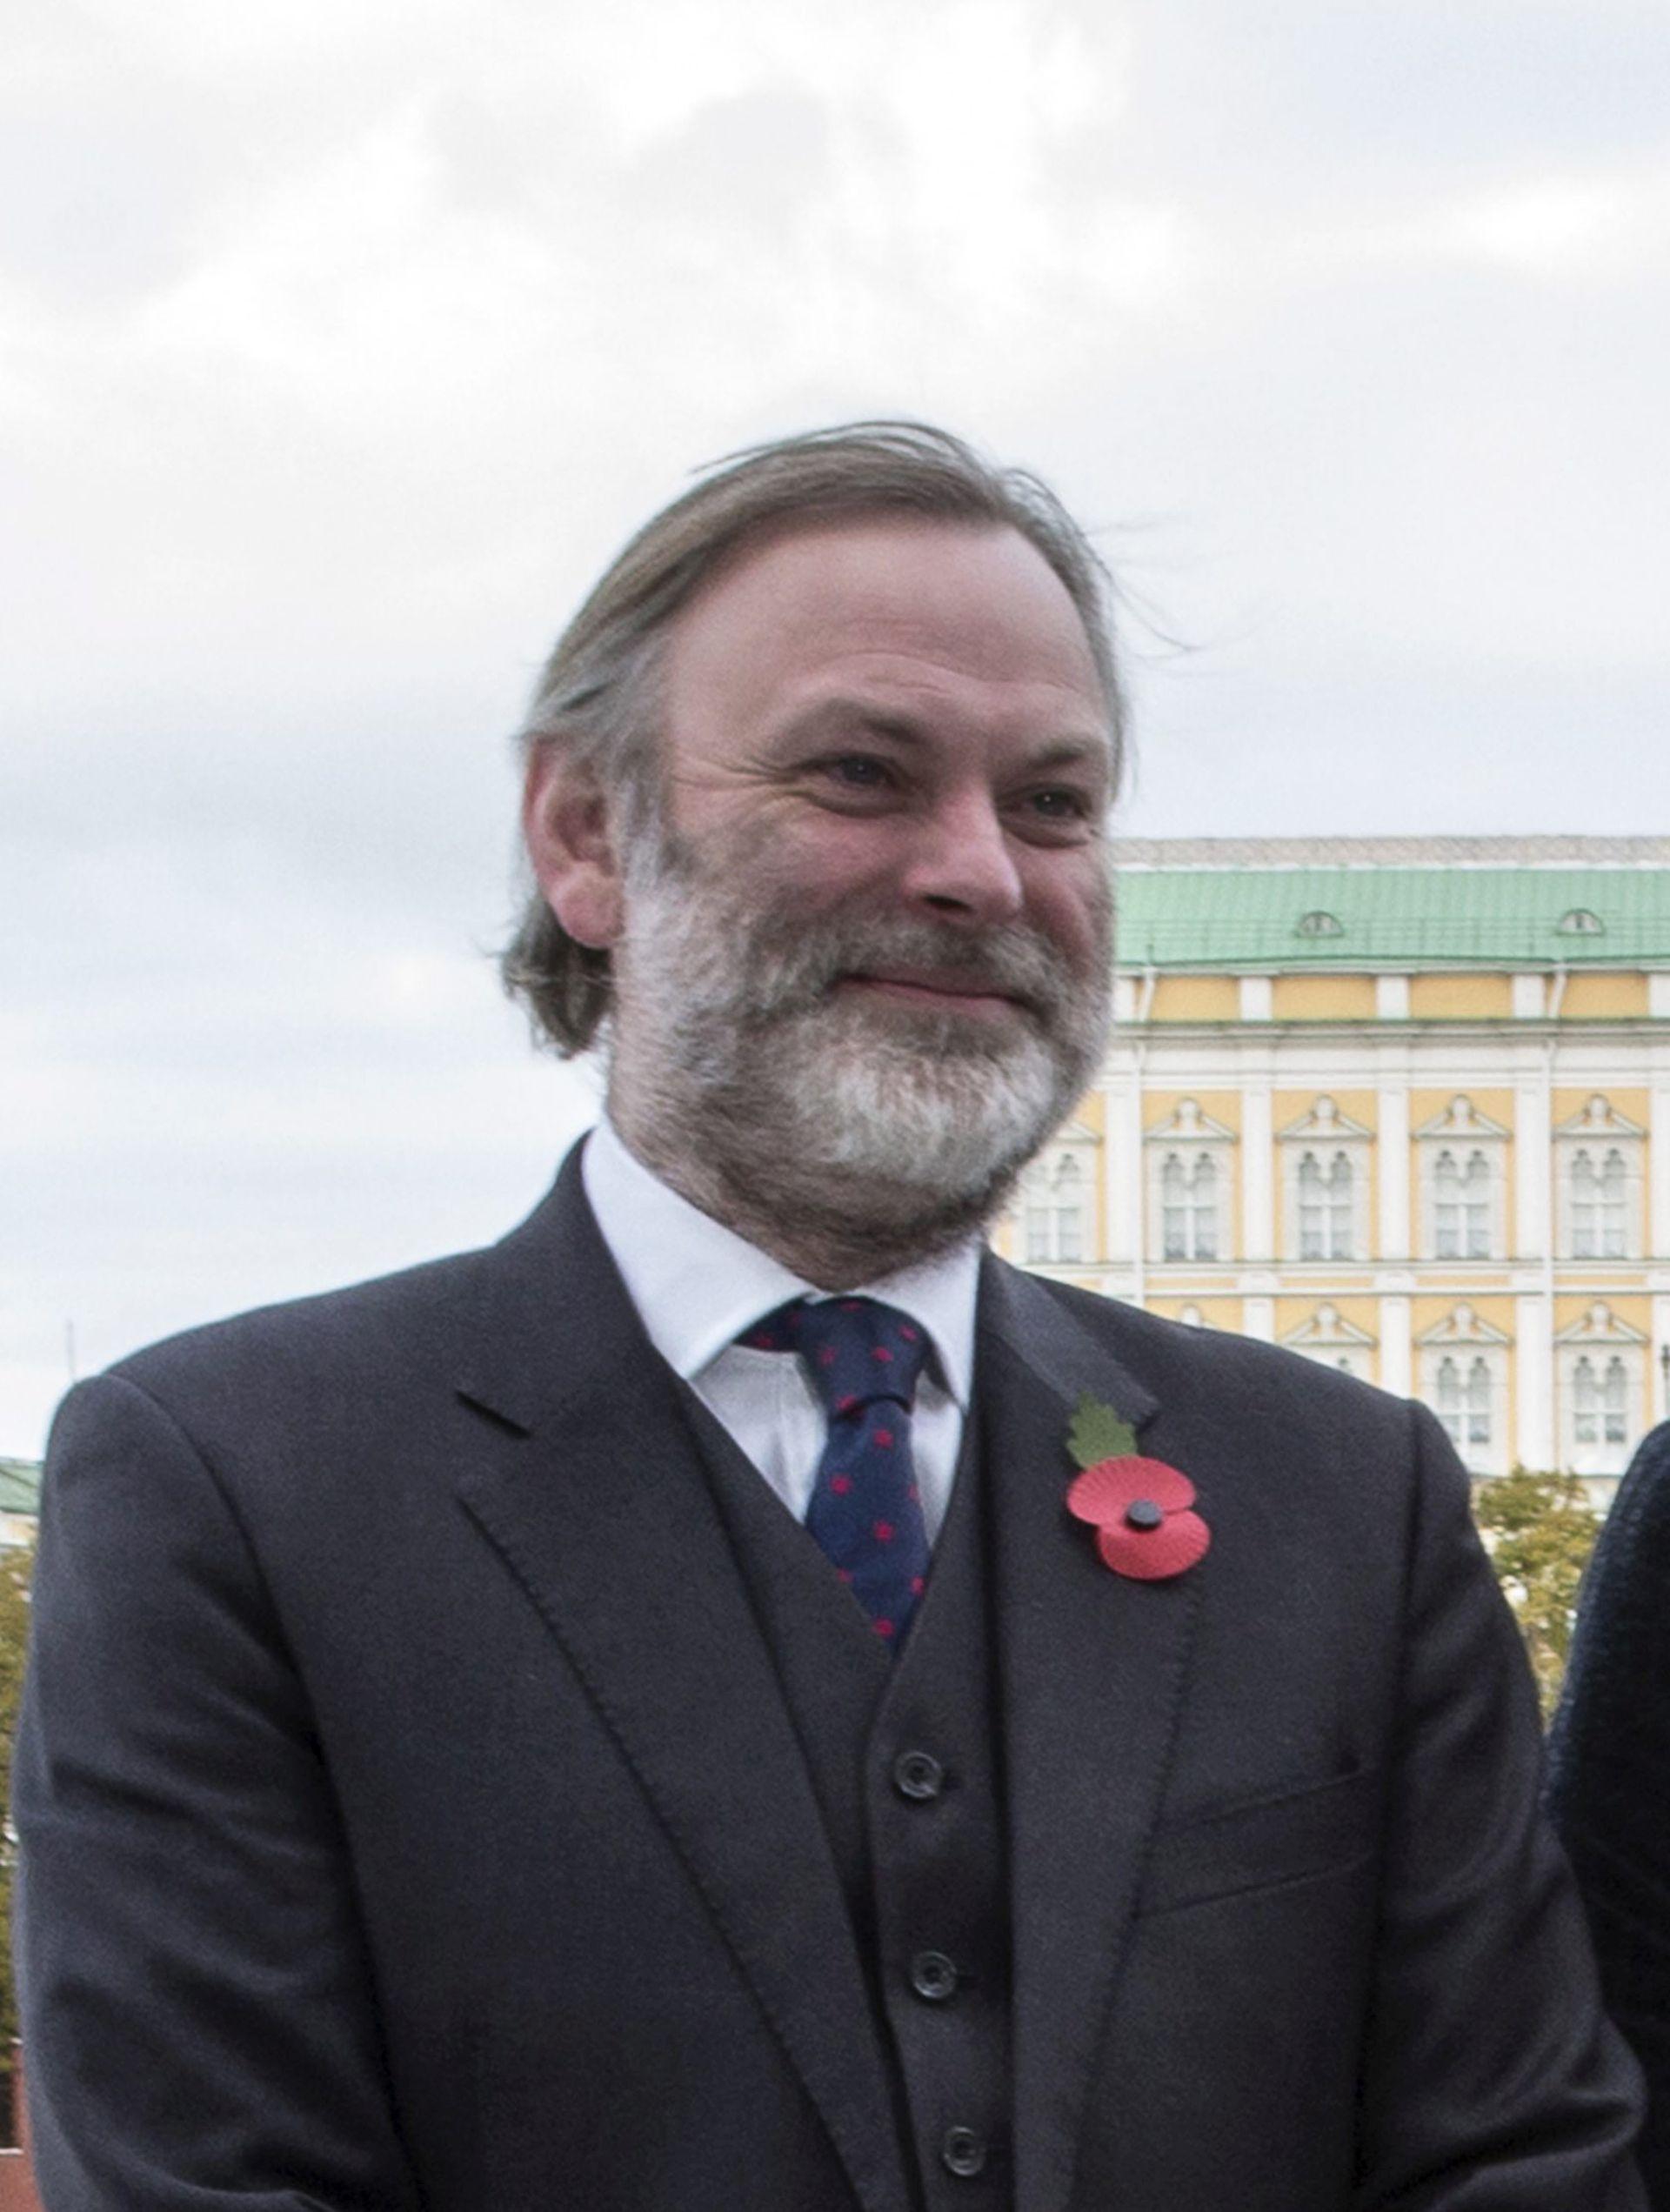 NAKON NENADANE OSTAVKE ROGERSA Tim Barrow novi britanski veleposlanik u EU